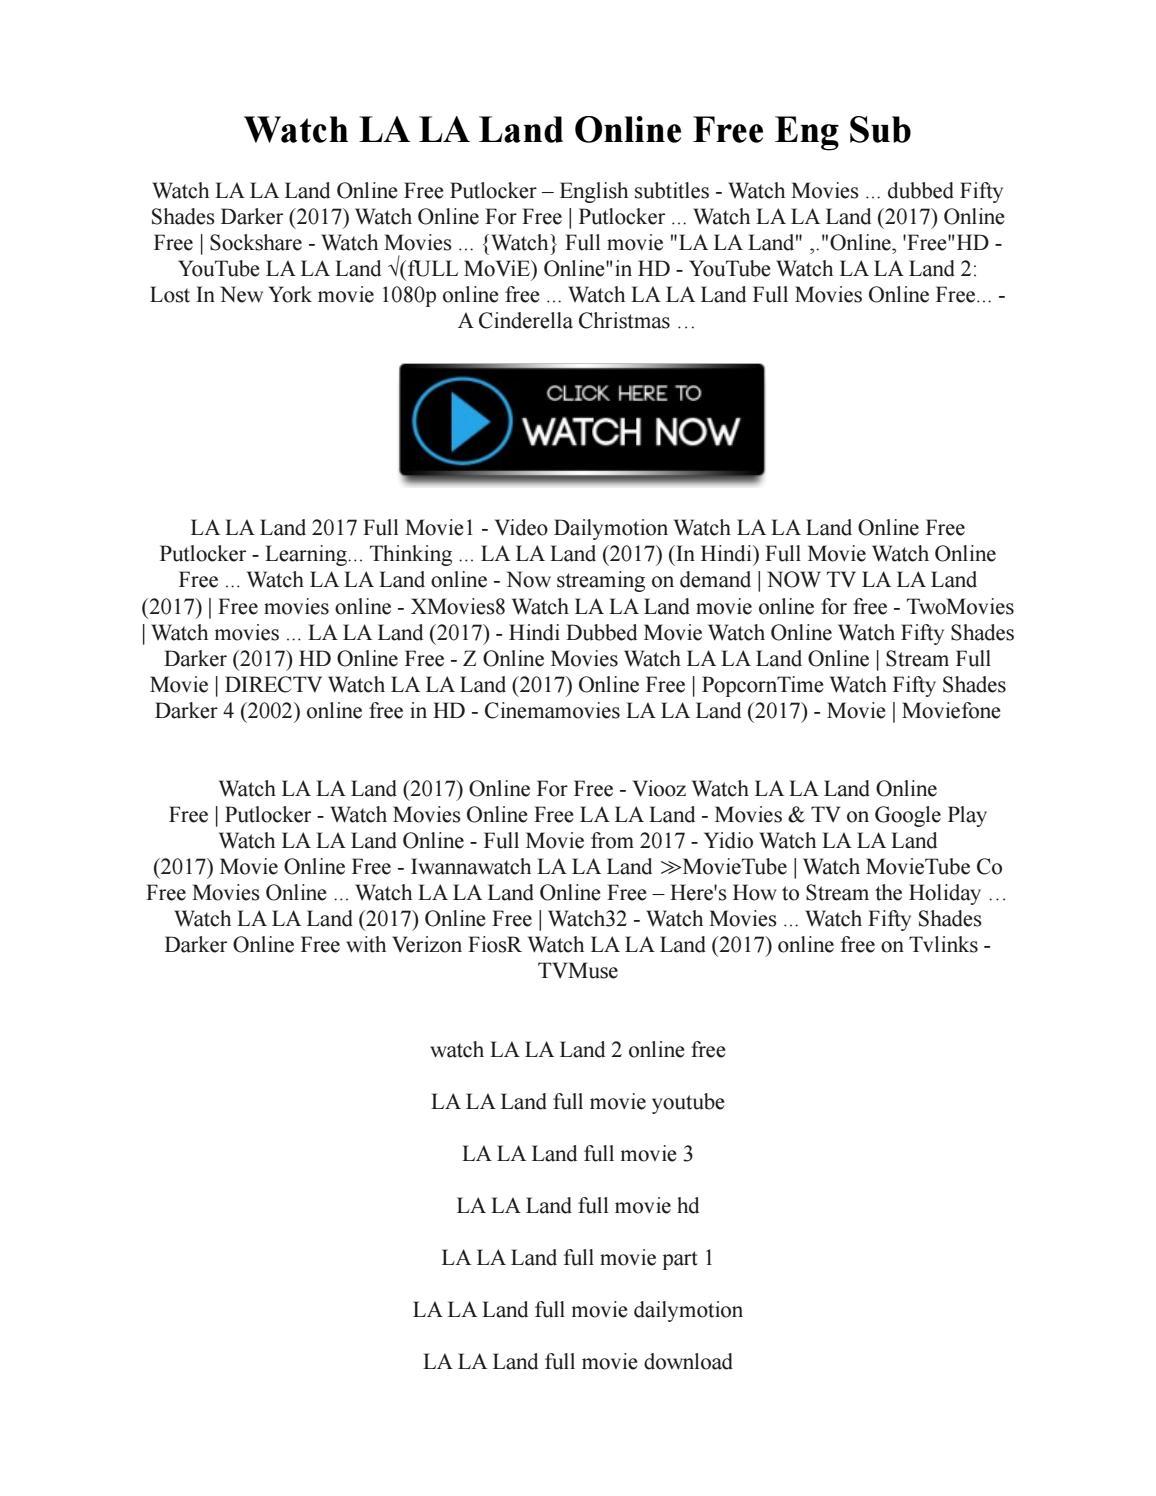 la la land full movie with english subtitles